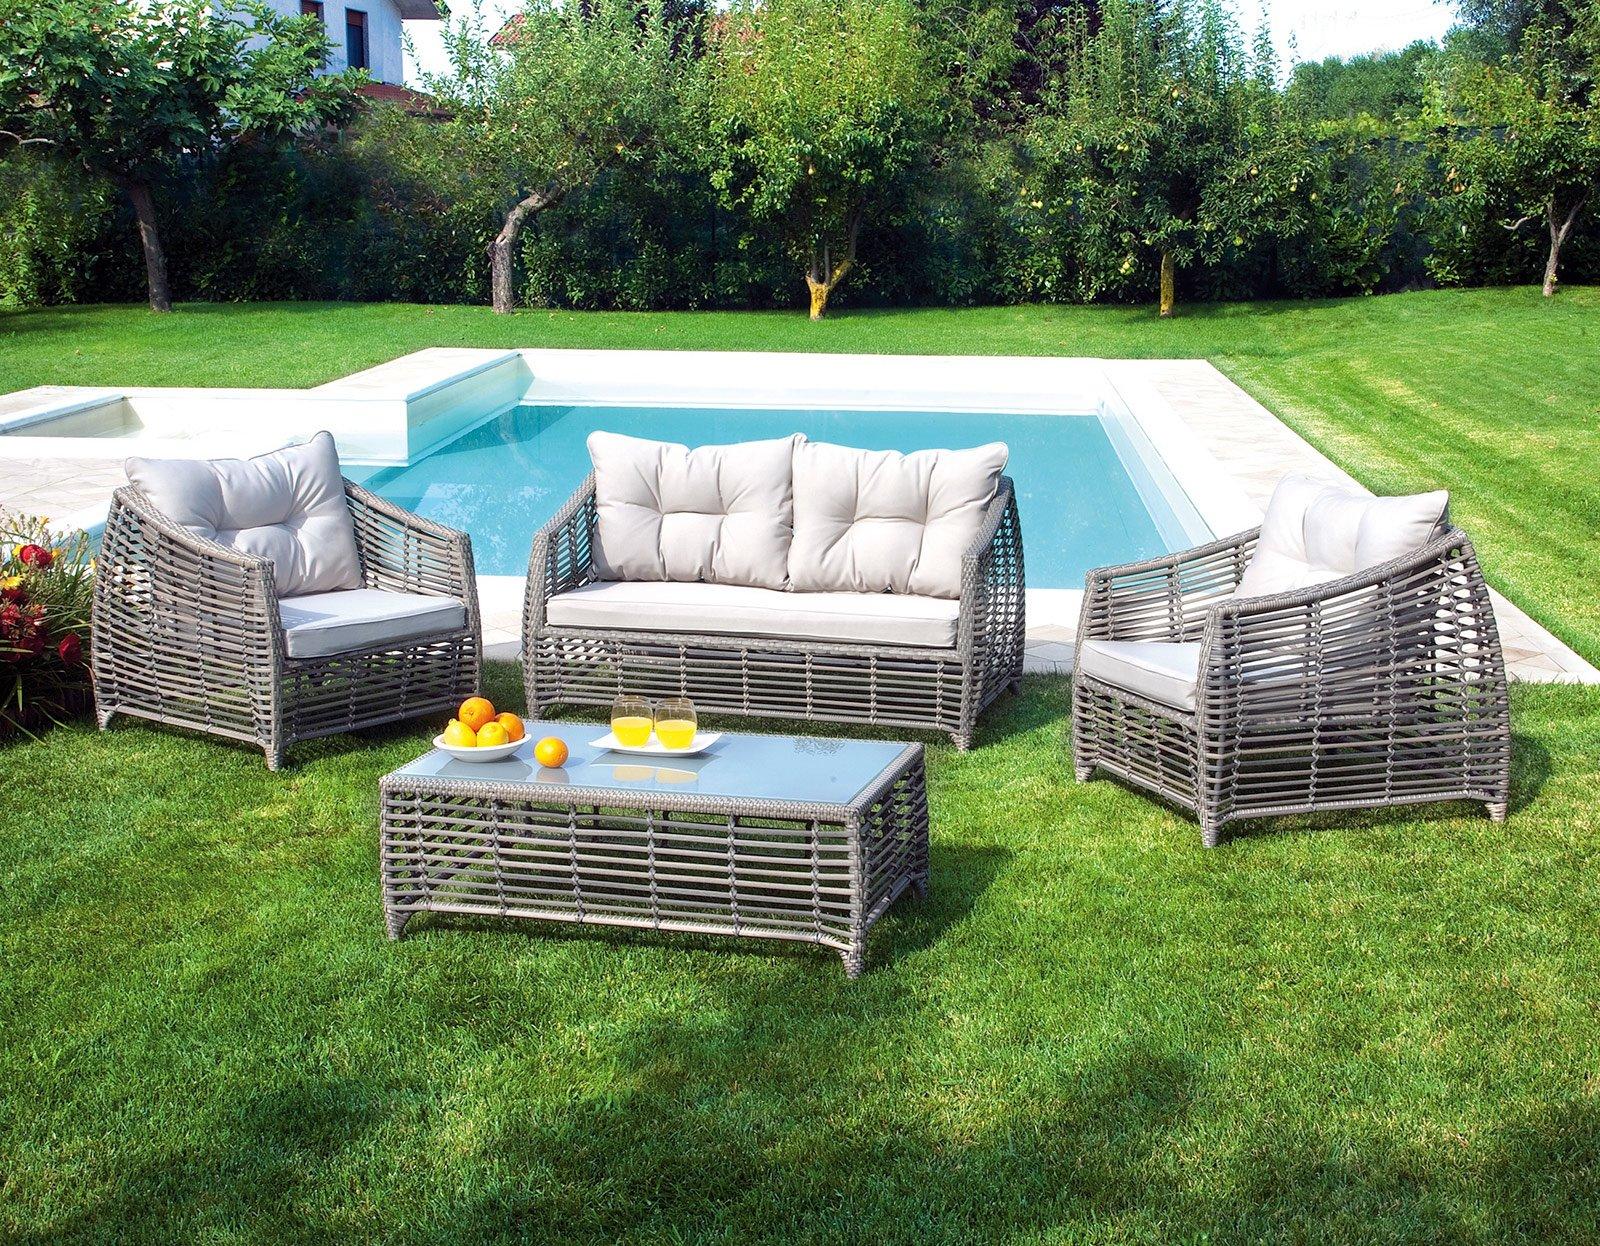 Far salotto in giardino o in terrazzo cose di casa - Terrazzo giardino ...